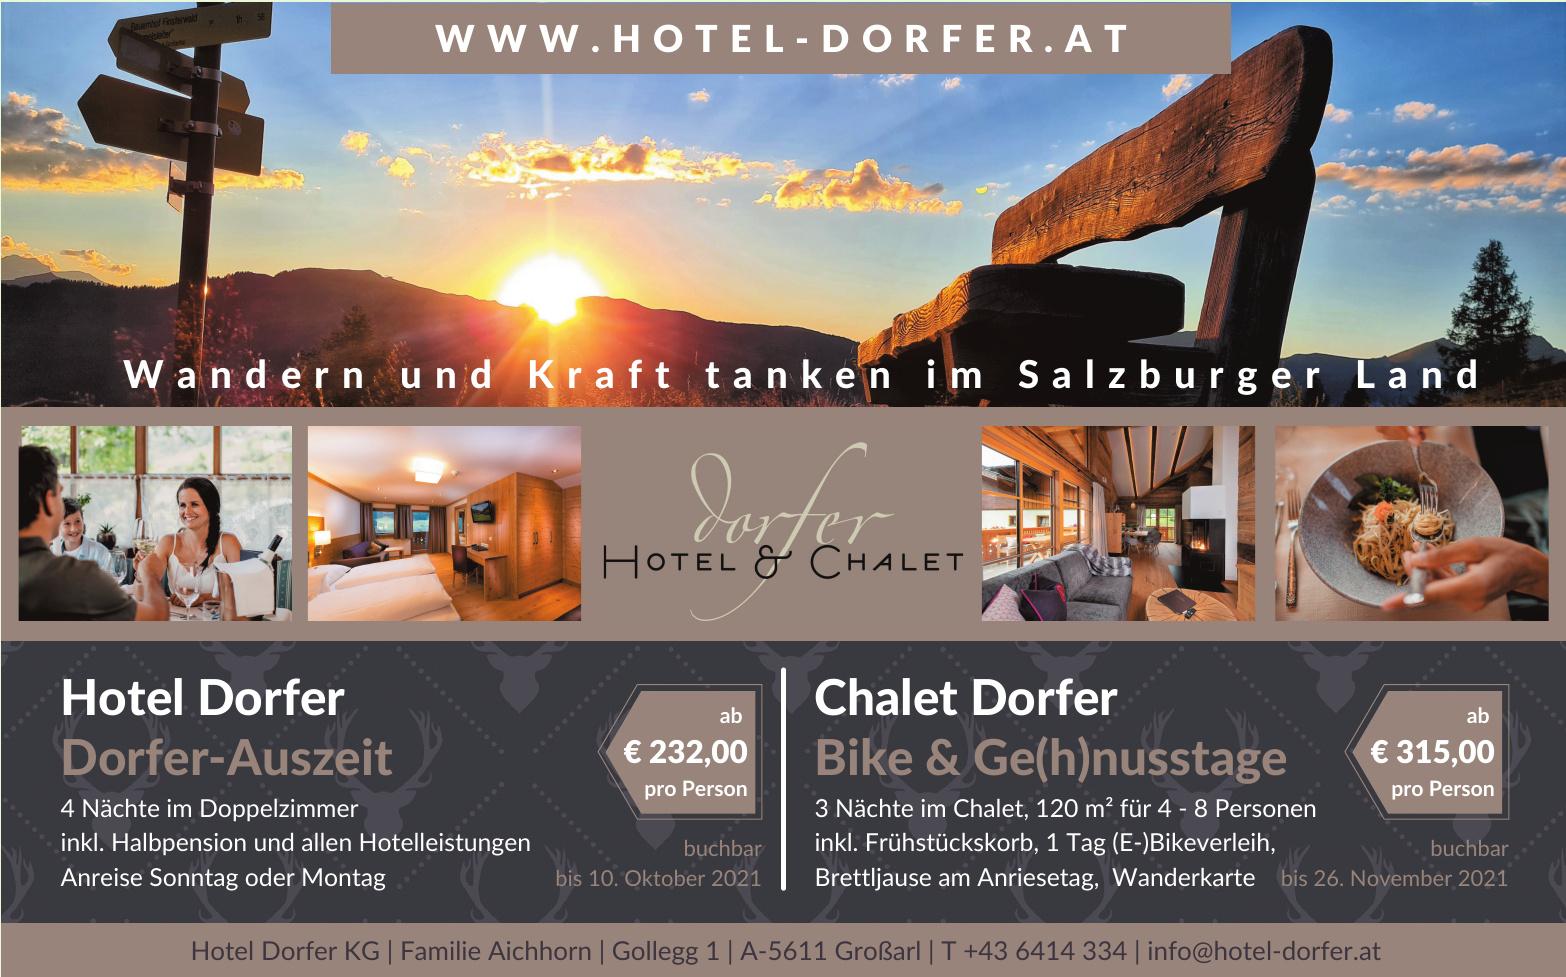 Hotel Dorfer KG